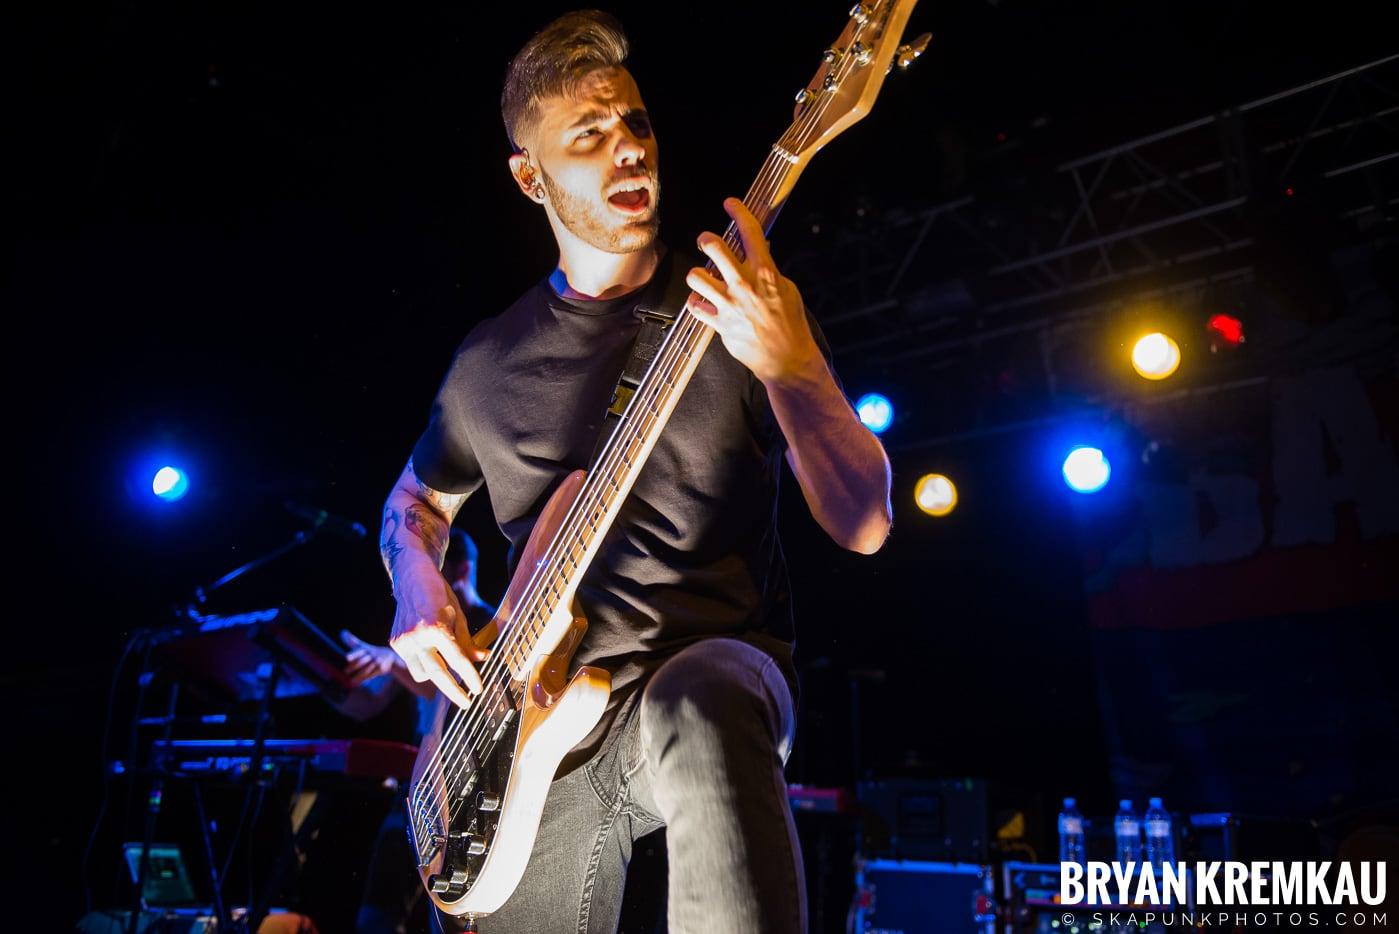 Ballyhoo! @ Starland Ballroom, Sayreville, NJ - 11.23.18 (16)